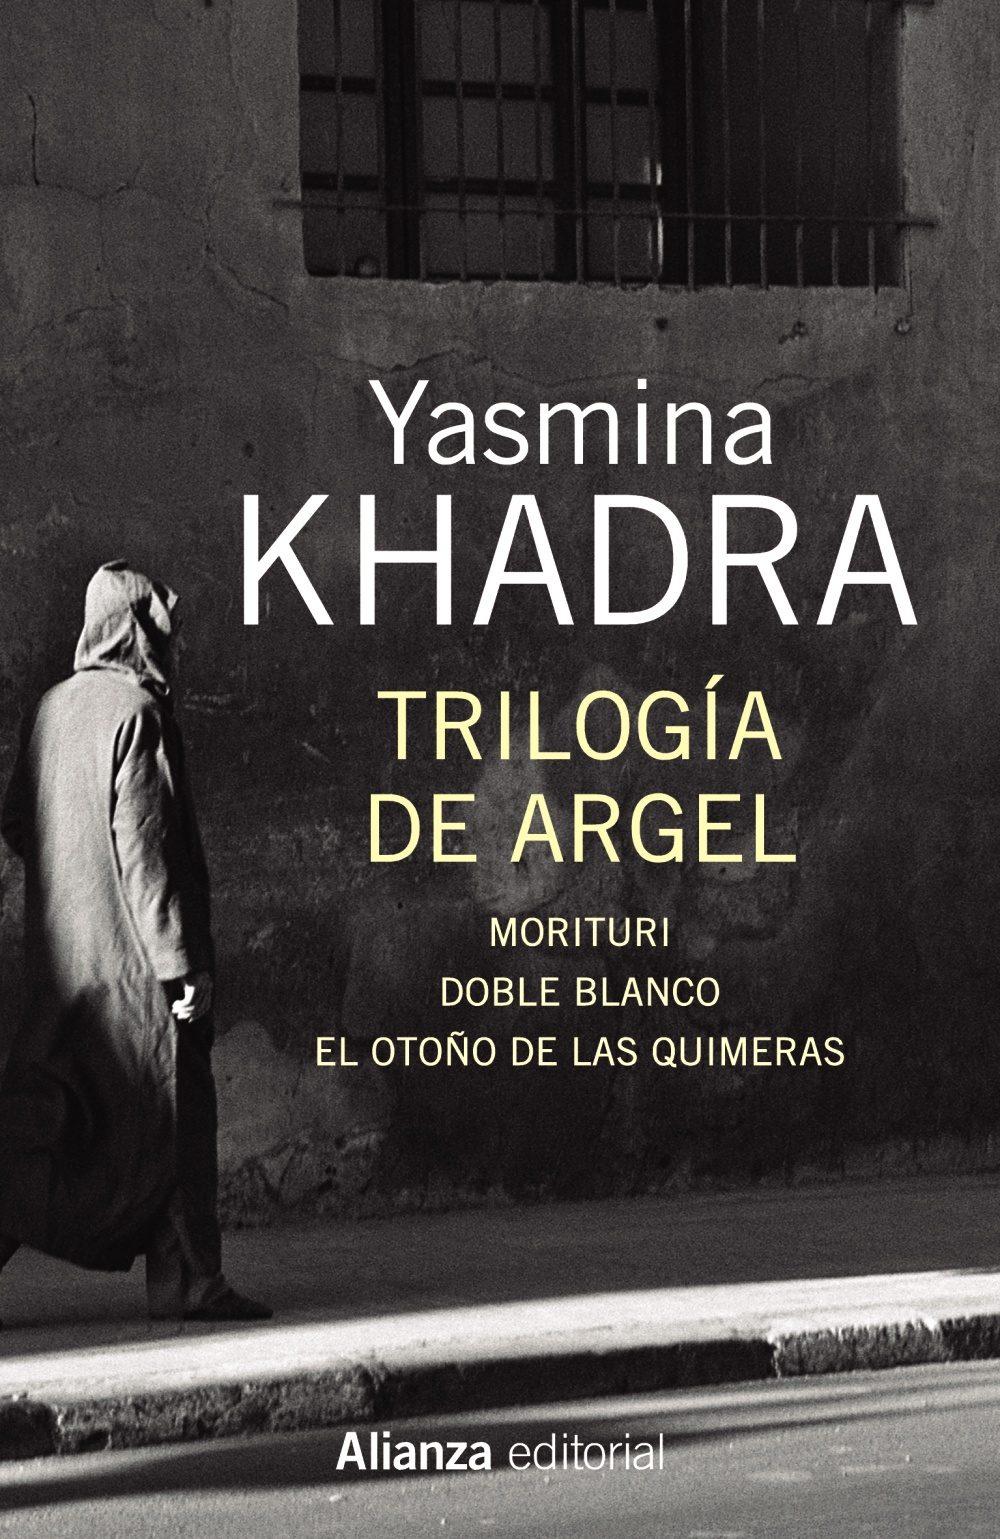 http://laantiguabiblos.blogspot.com/2019/01/trilogia-de-argel-yasmina-khadra.html